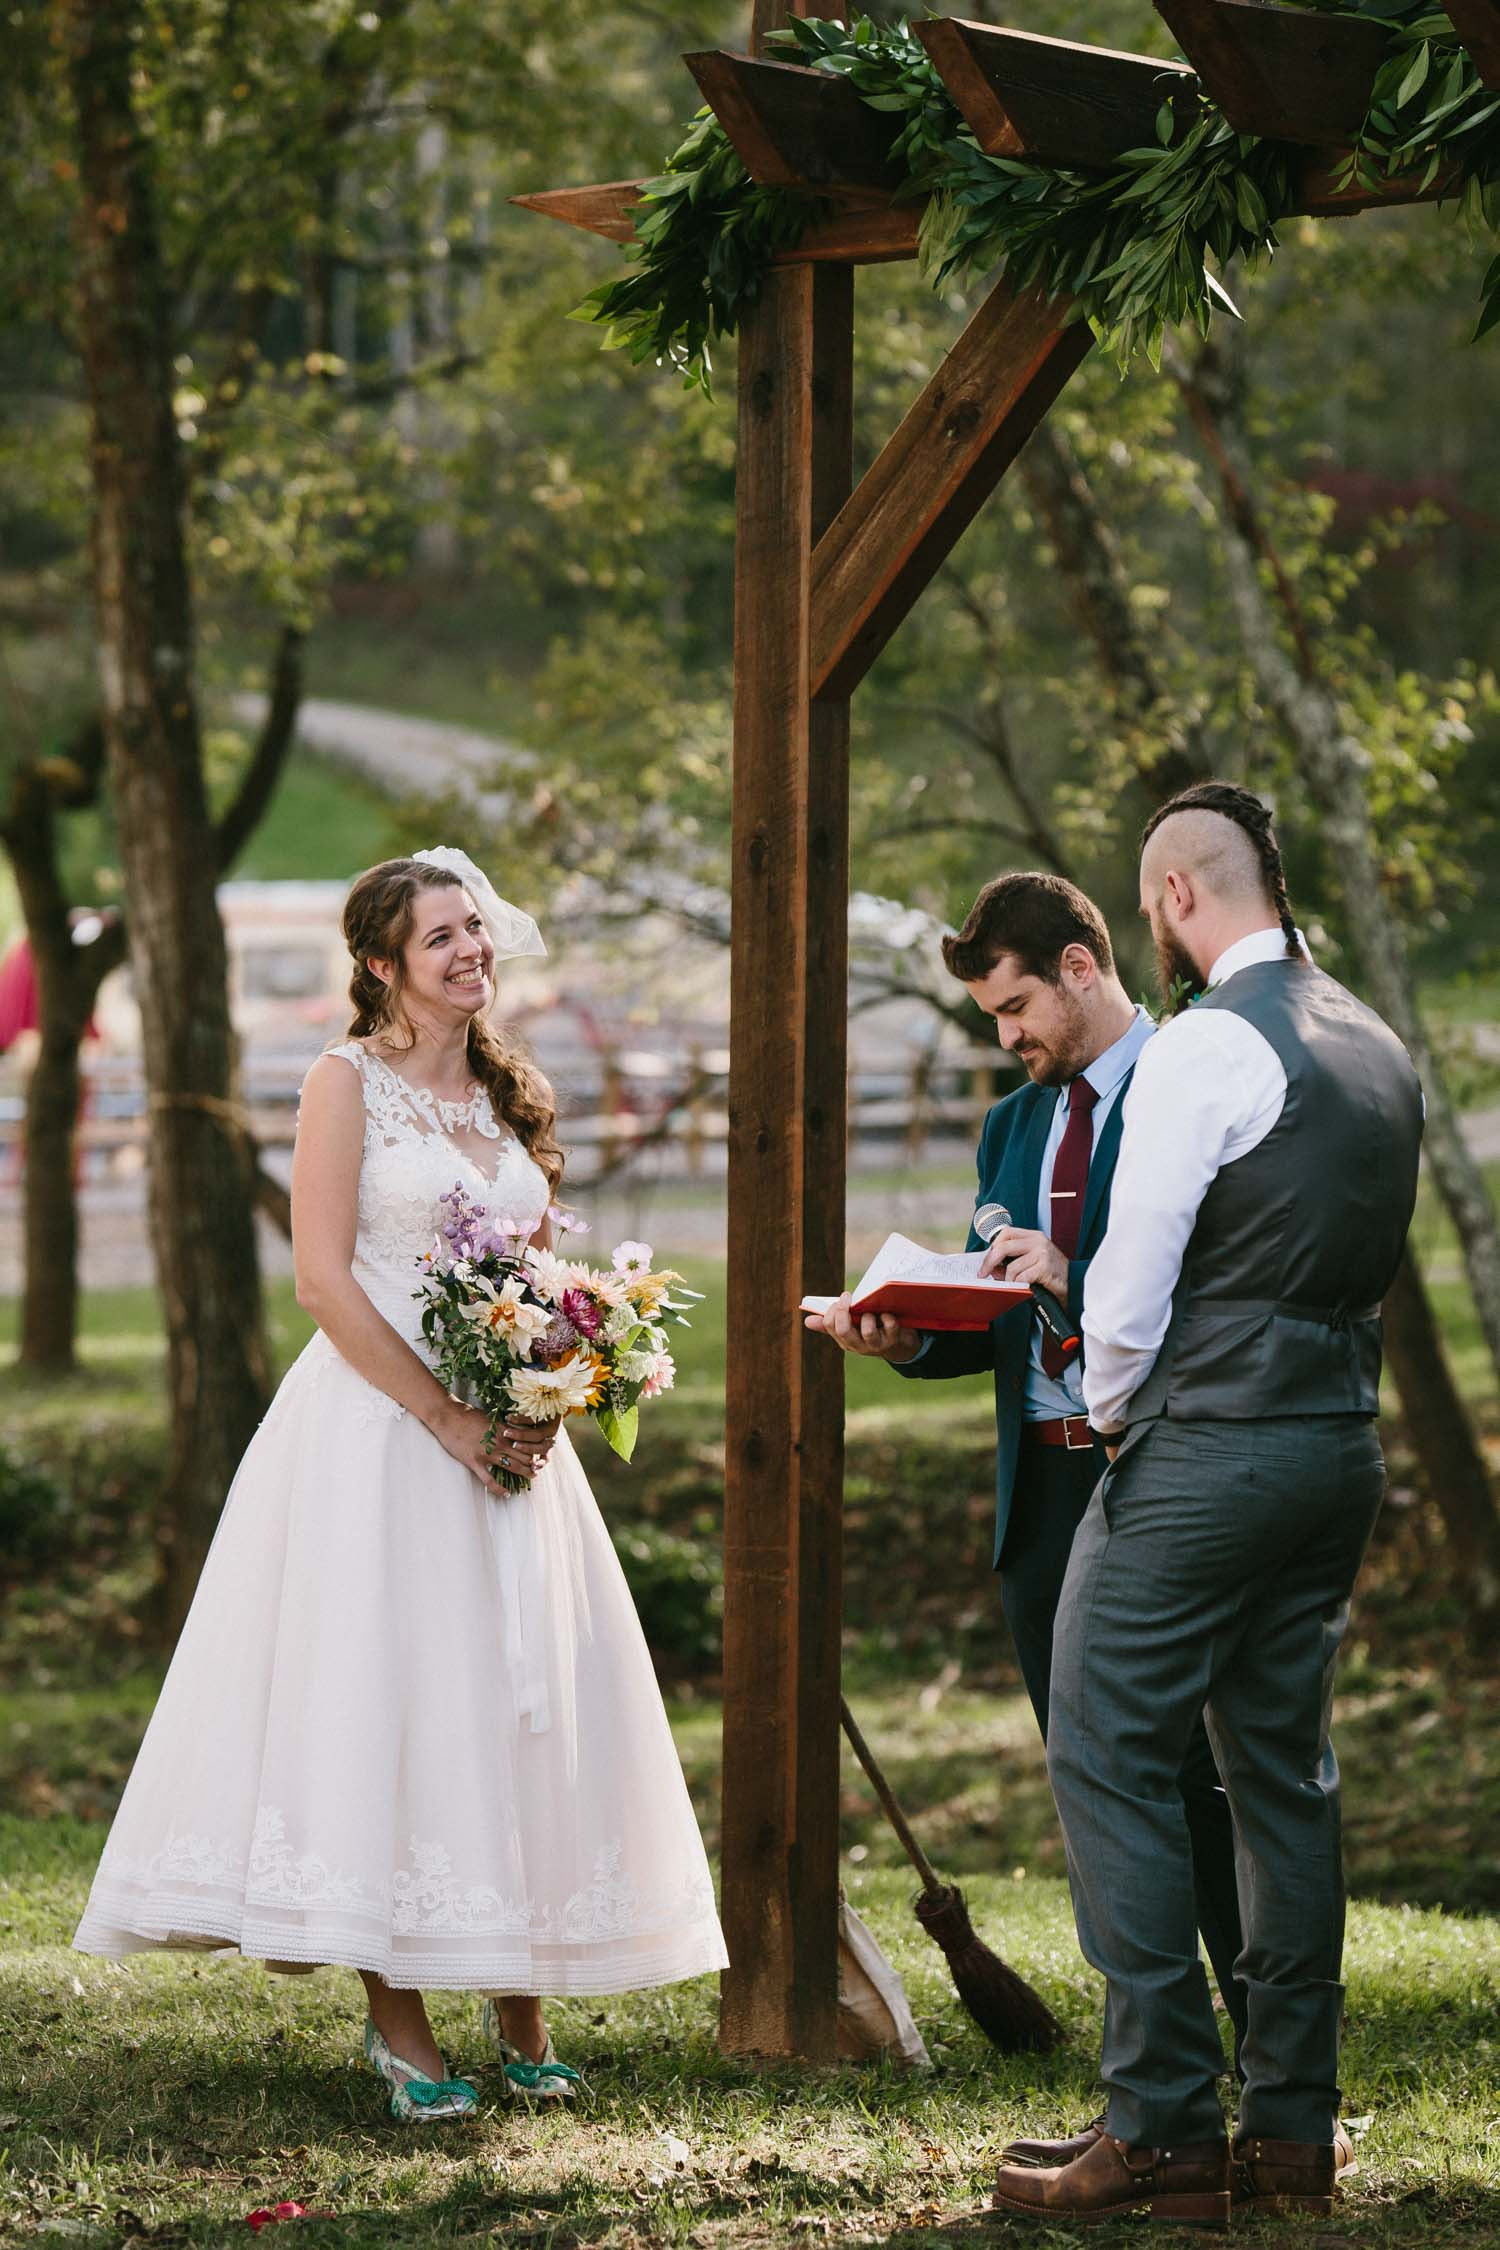 Angeli_Joe__Asheville_Wedding-43.jpg